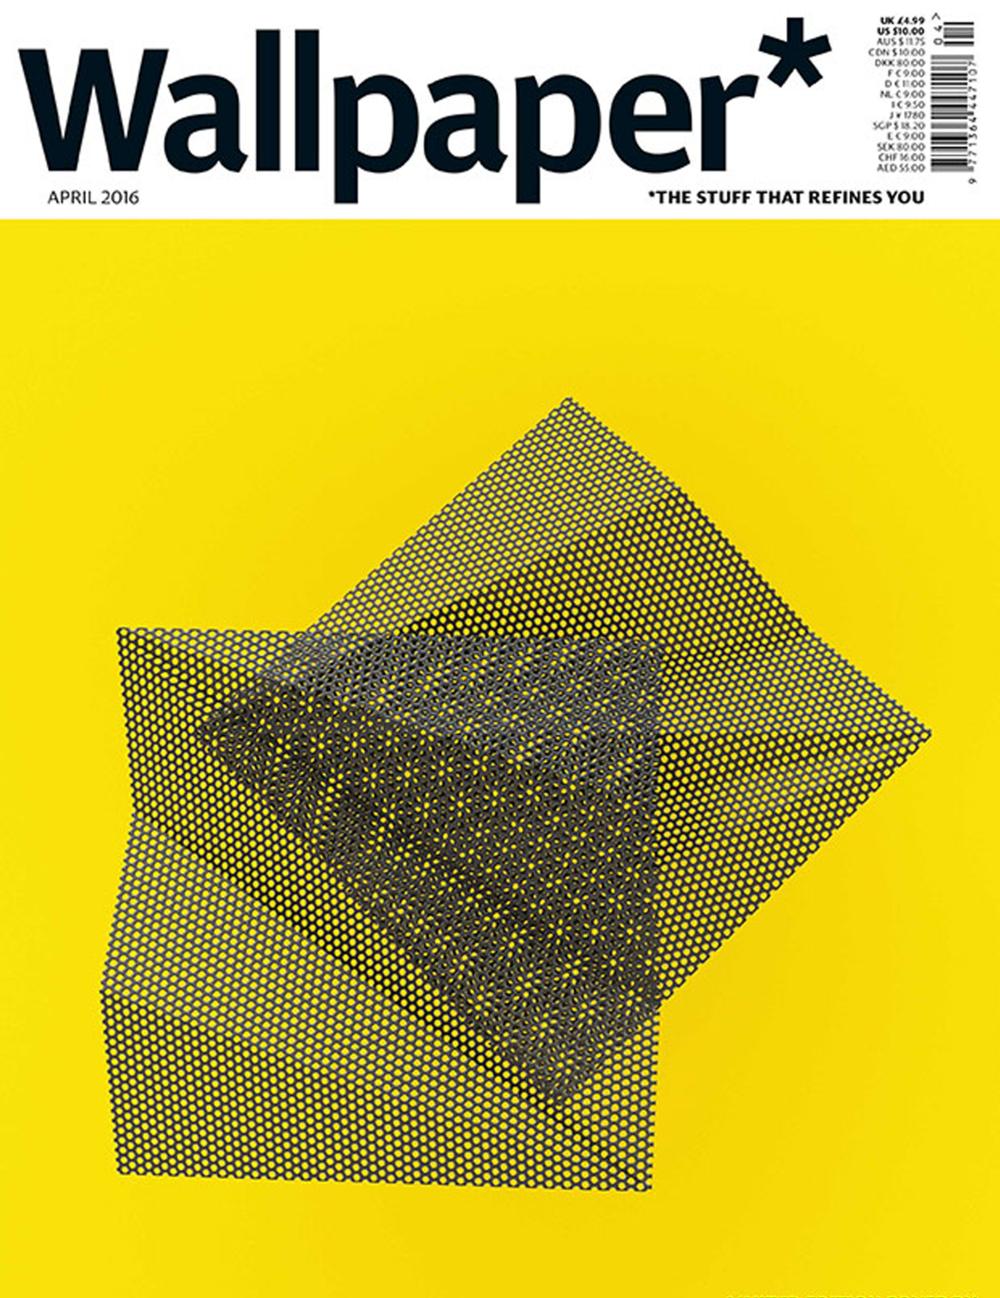 Wallpaper-April 2016.png